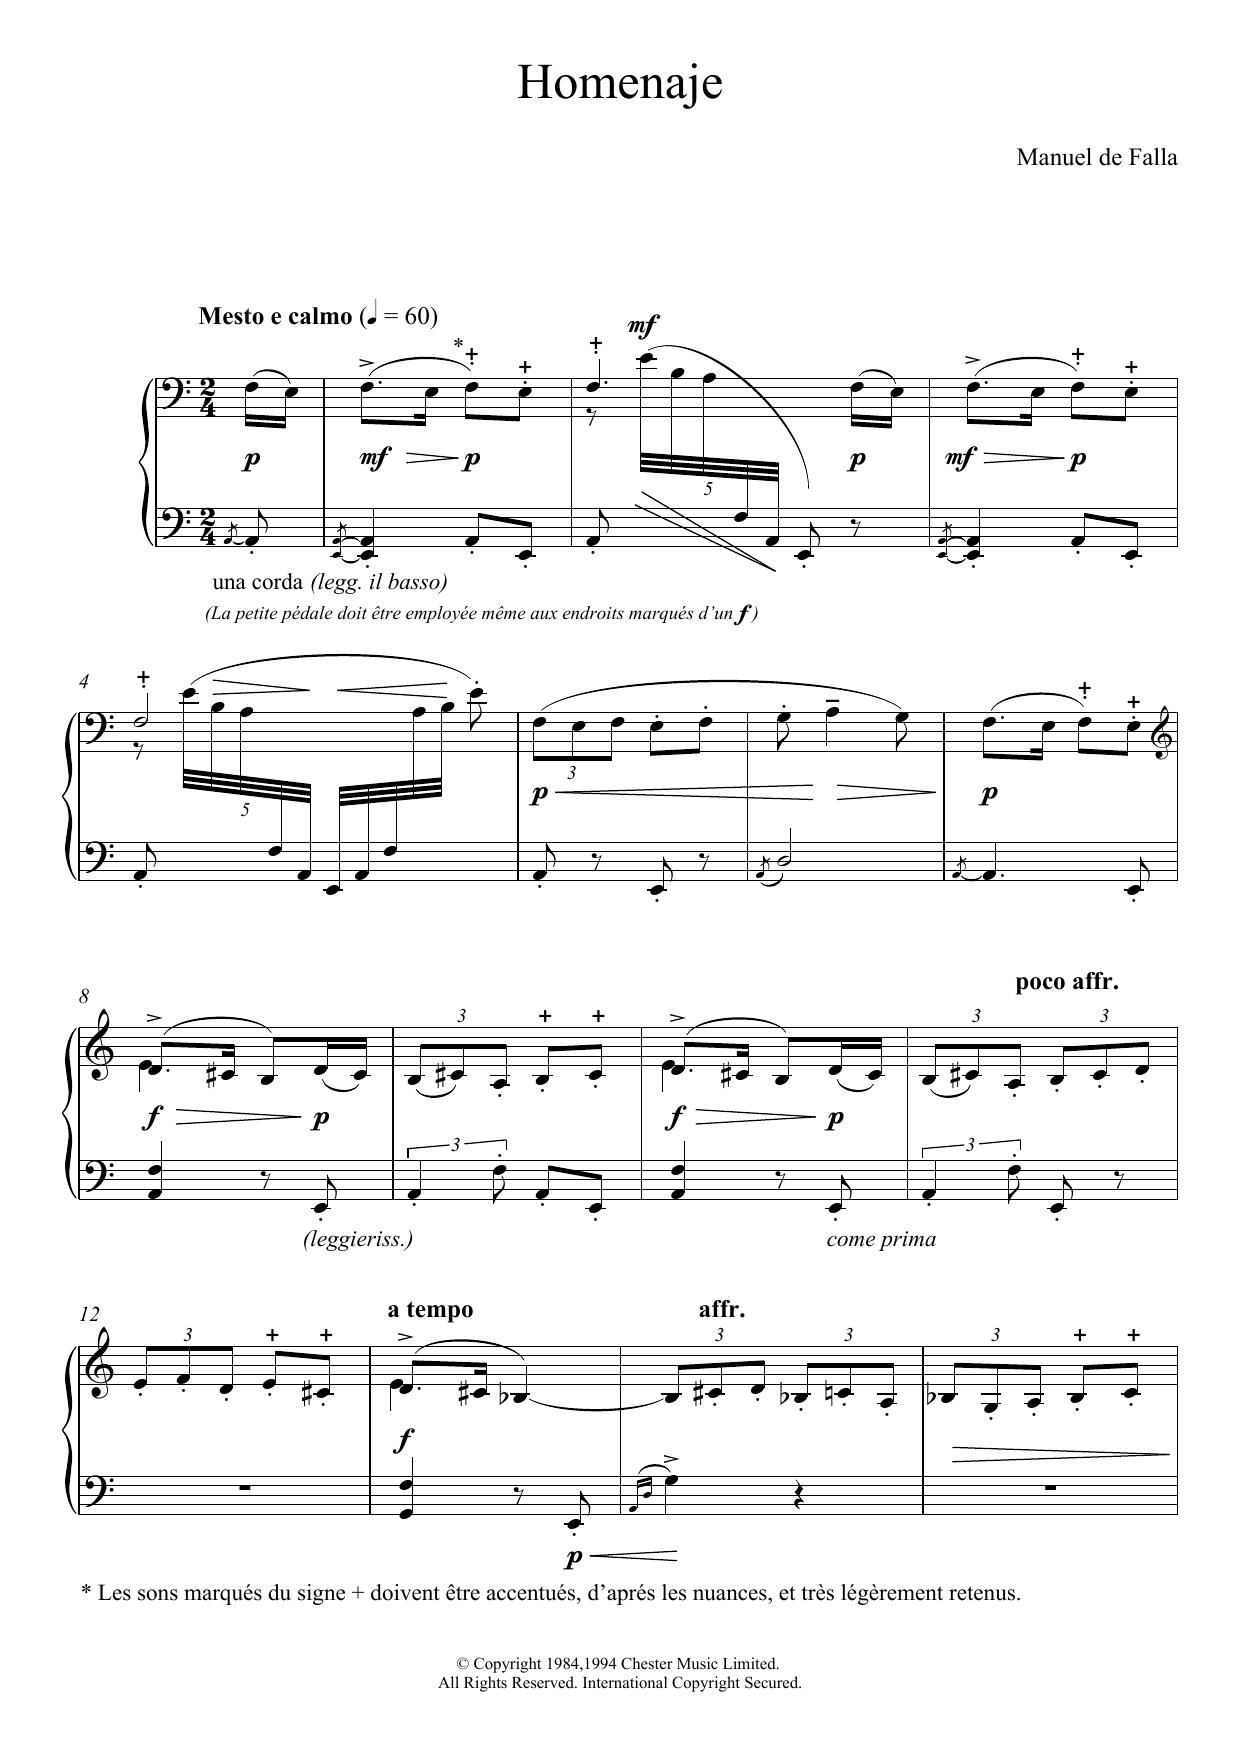 Homenaje Sheet Music